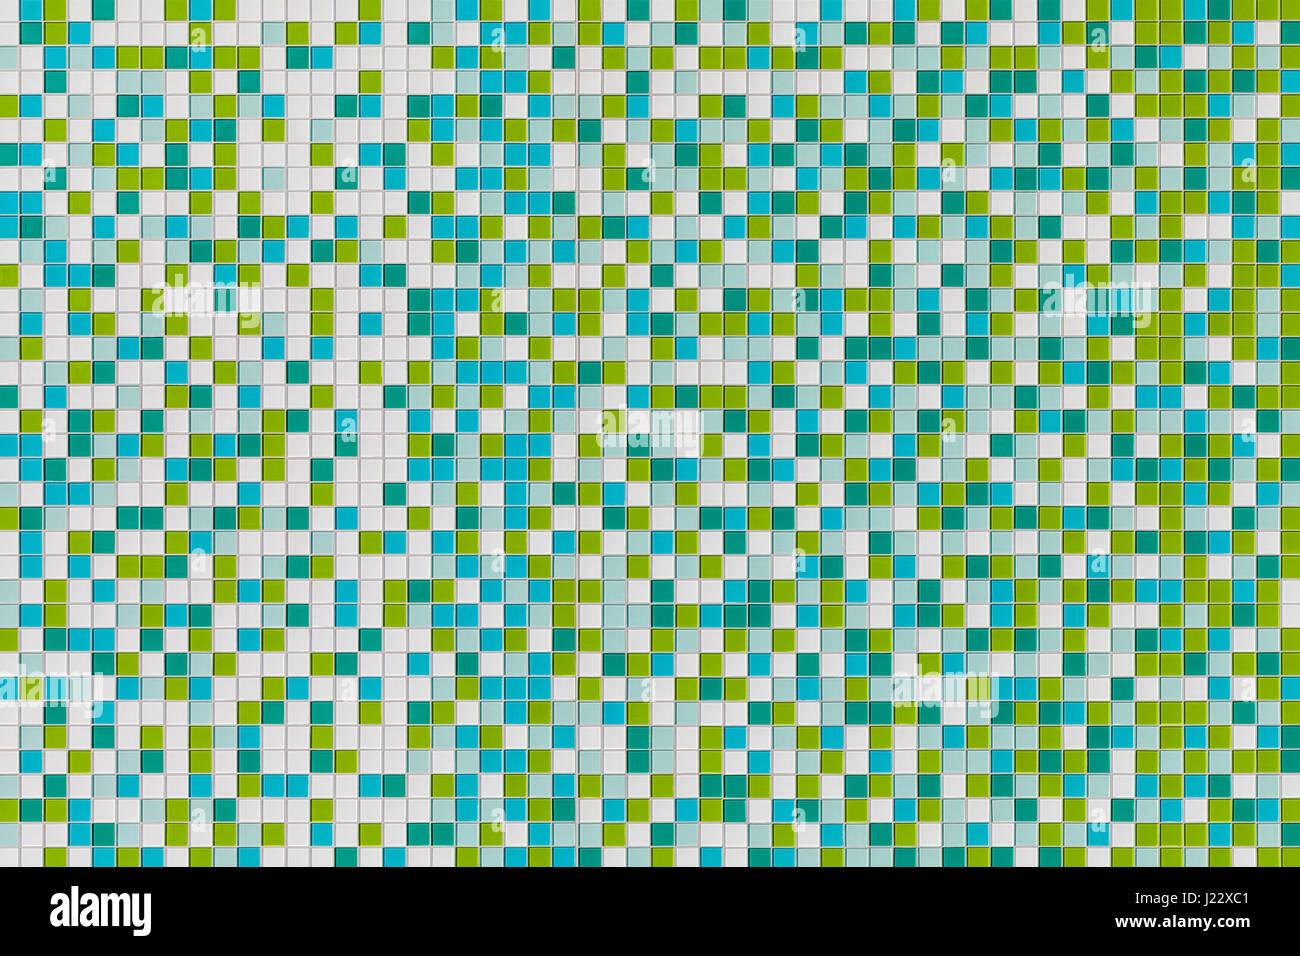 Glasmosaik, Mosaik, Glas, Glasfliesen, Fliesen, Muster, Quadrat, Studio